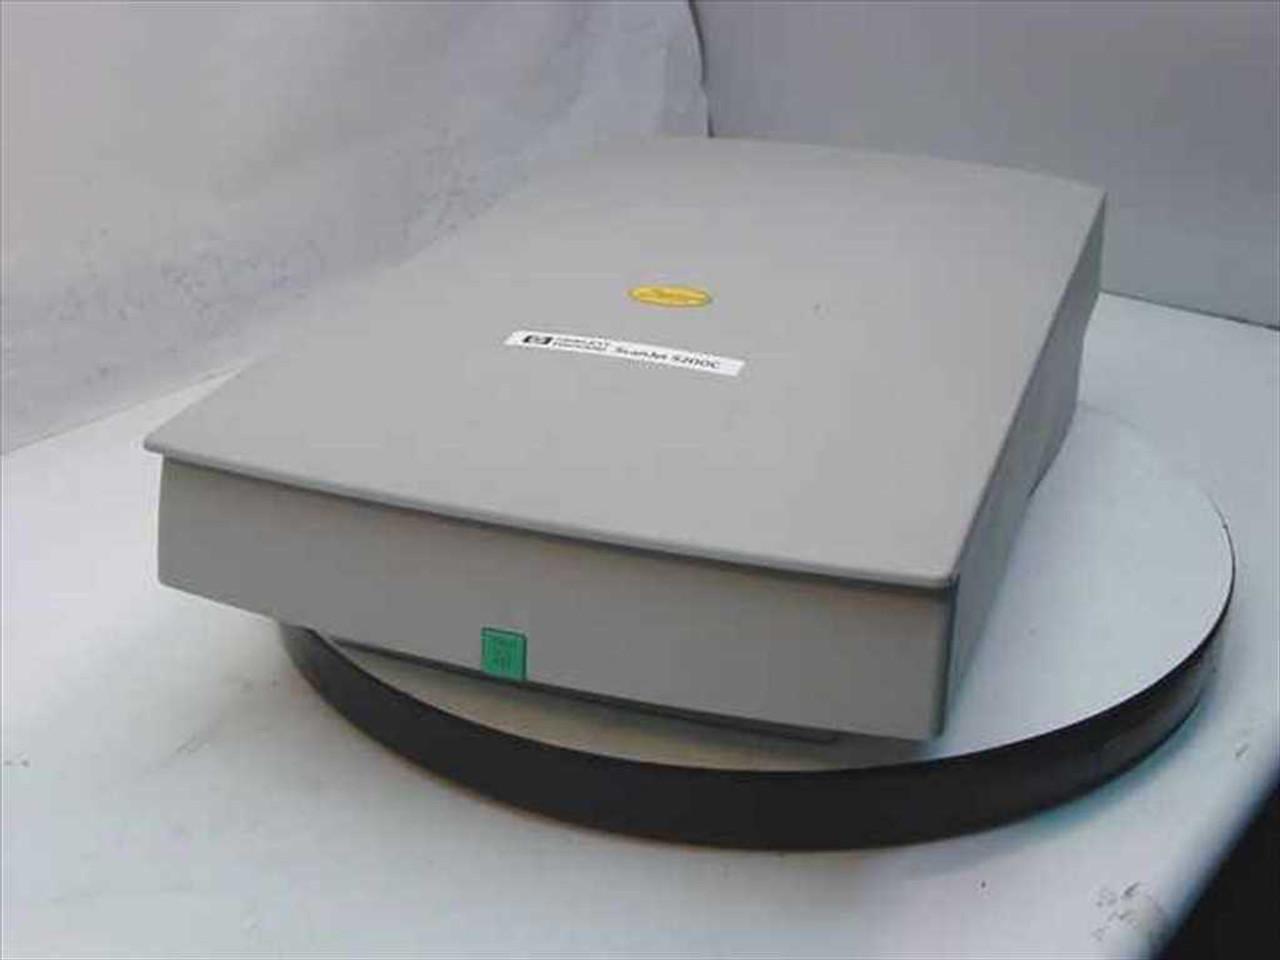 HEWLETT PACKARD SCANJET 5200C DRIVER FOR WINDOWS 7